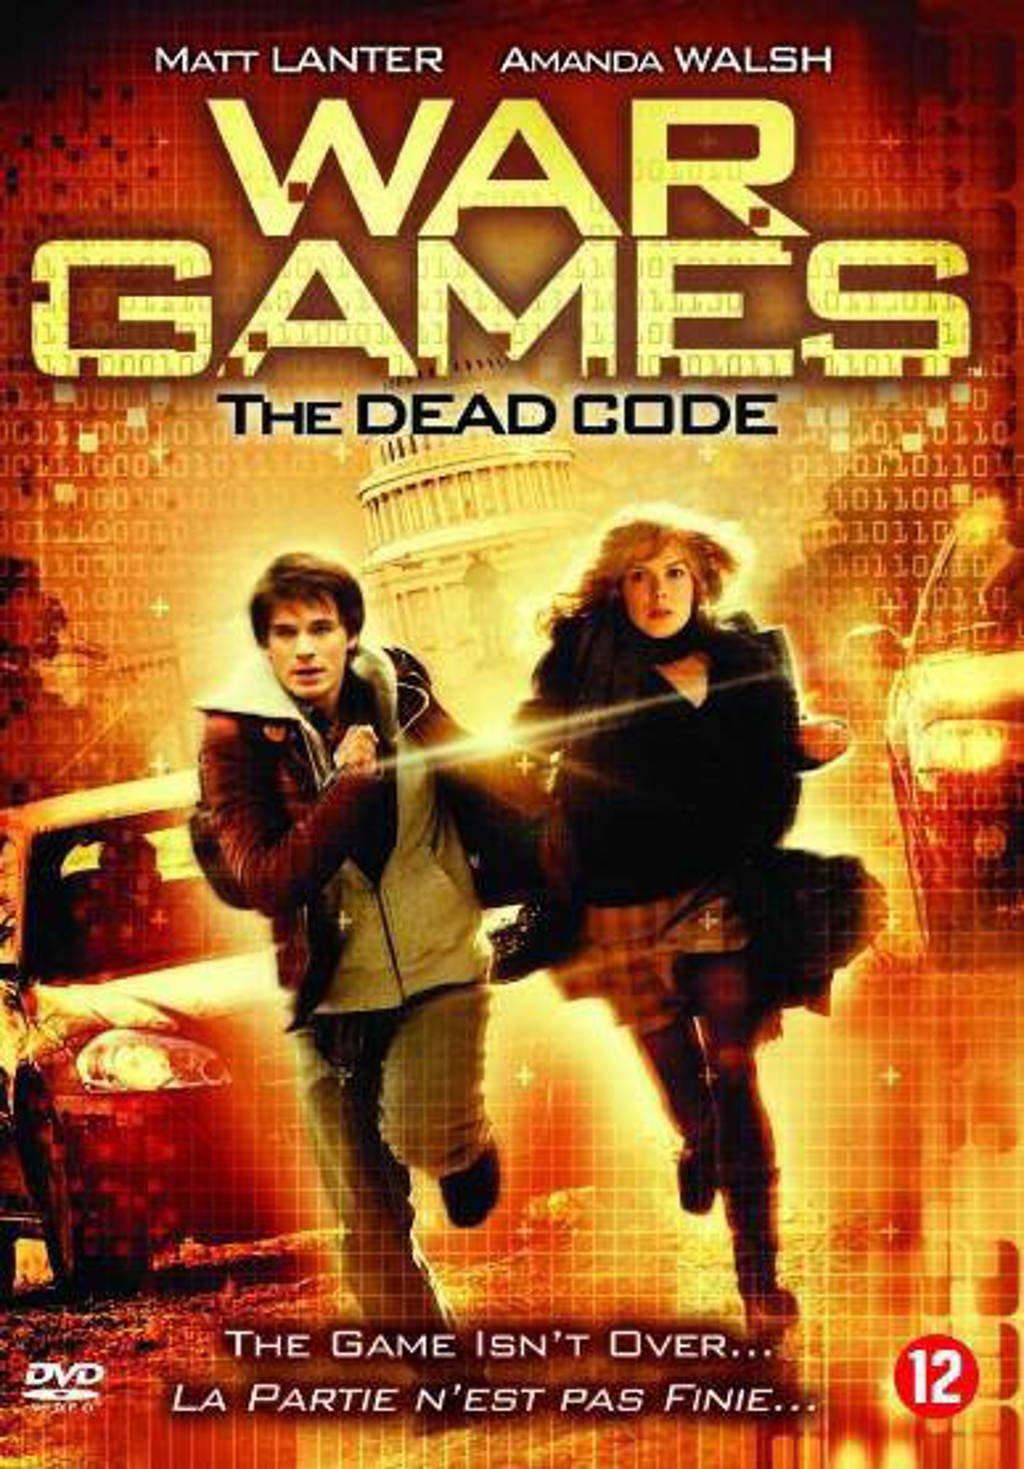 Wargames - the dead code (DVD)